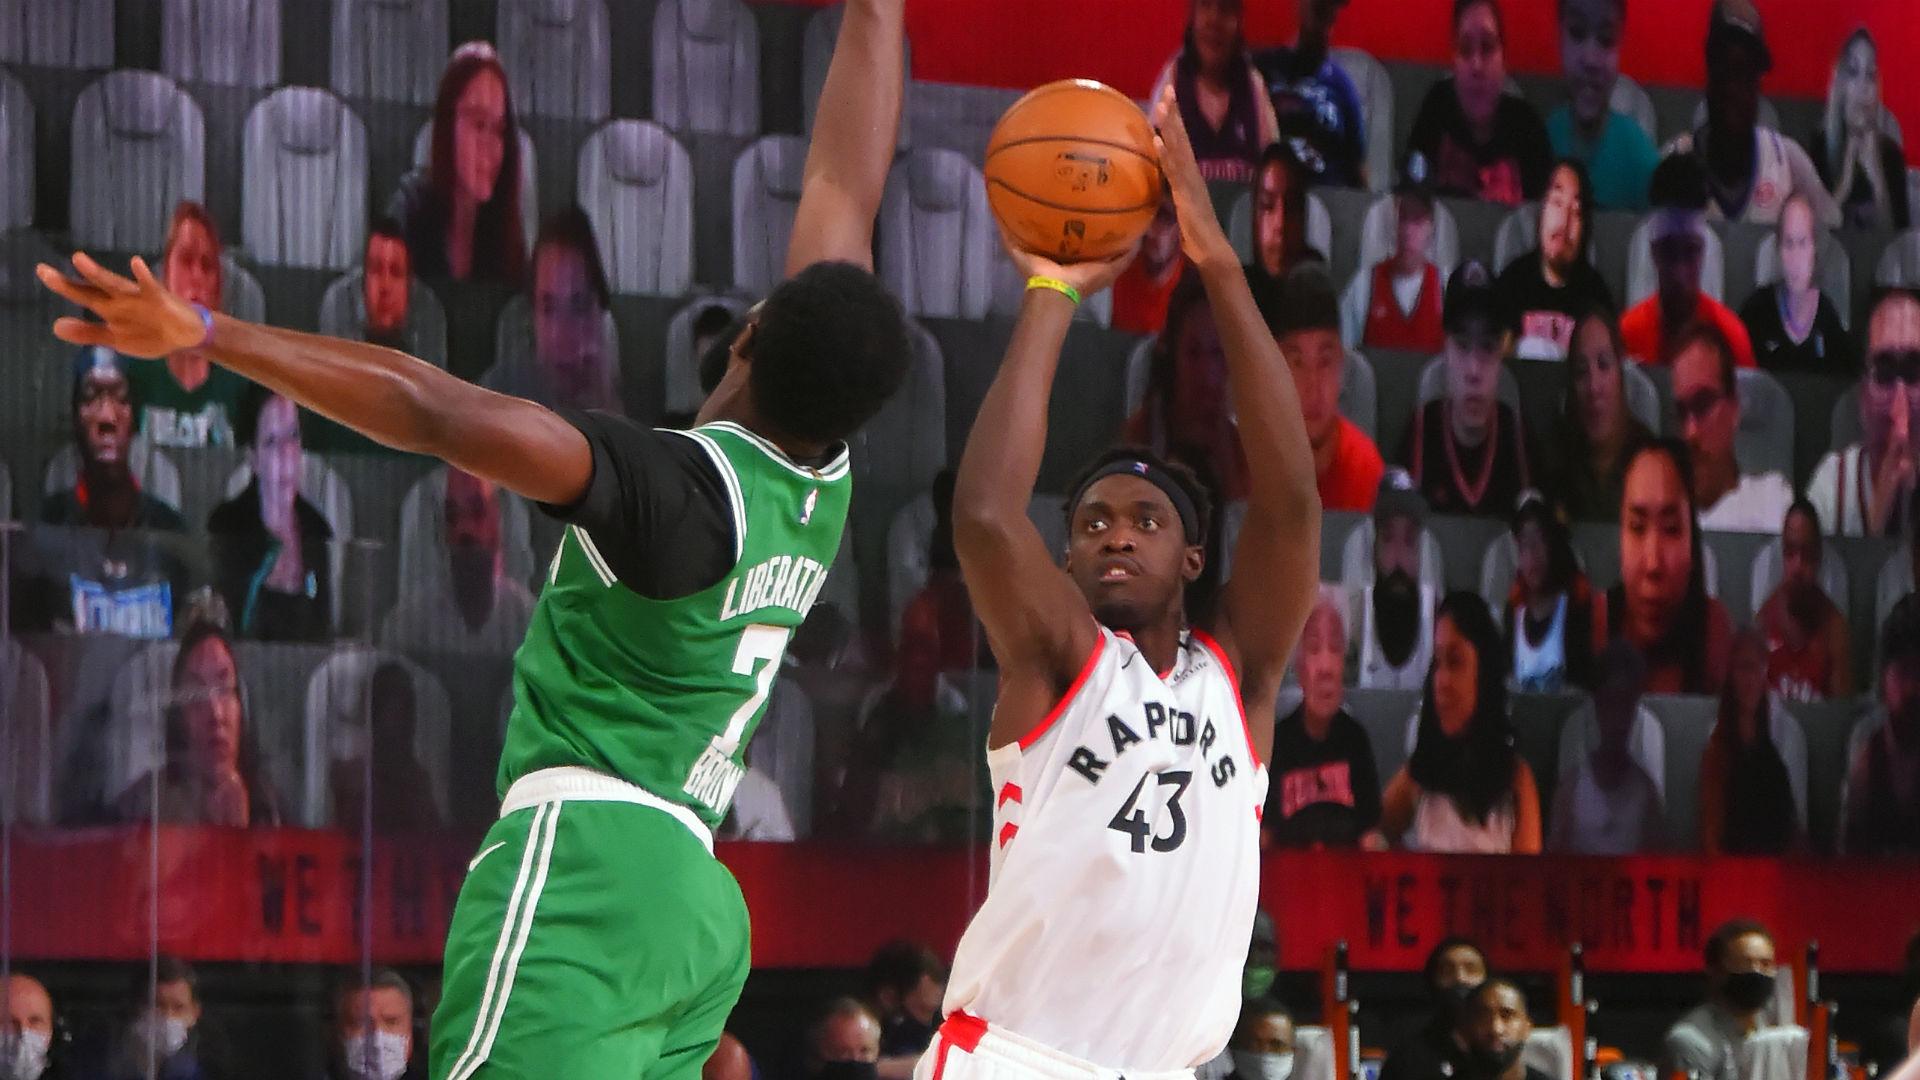 Nba Playoffs 2020 Boston Celtics Vs Toronto Raptors Series Preview Nba Com Australia The Official Site Of The Nba